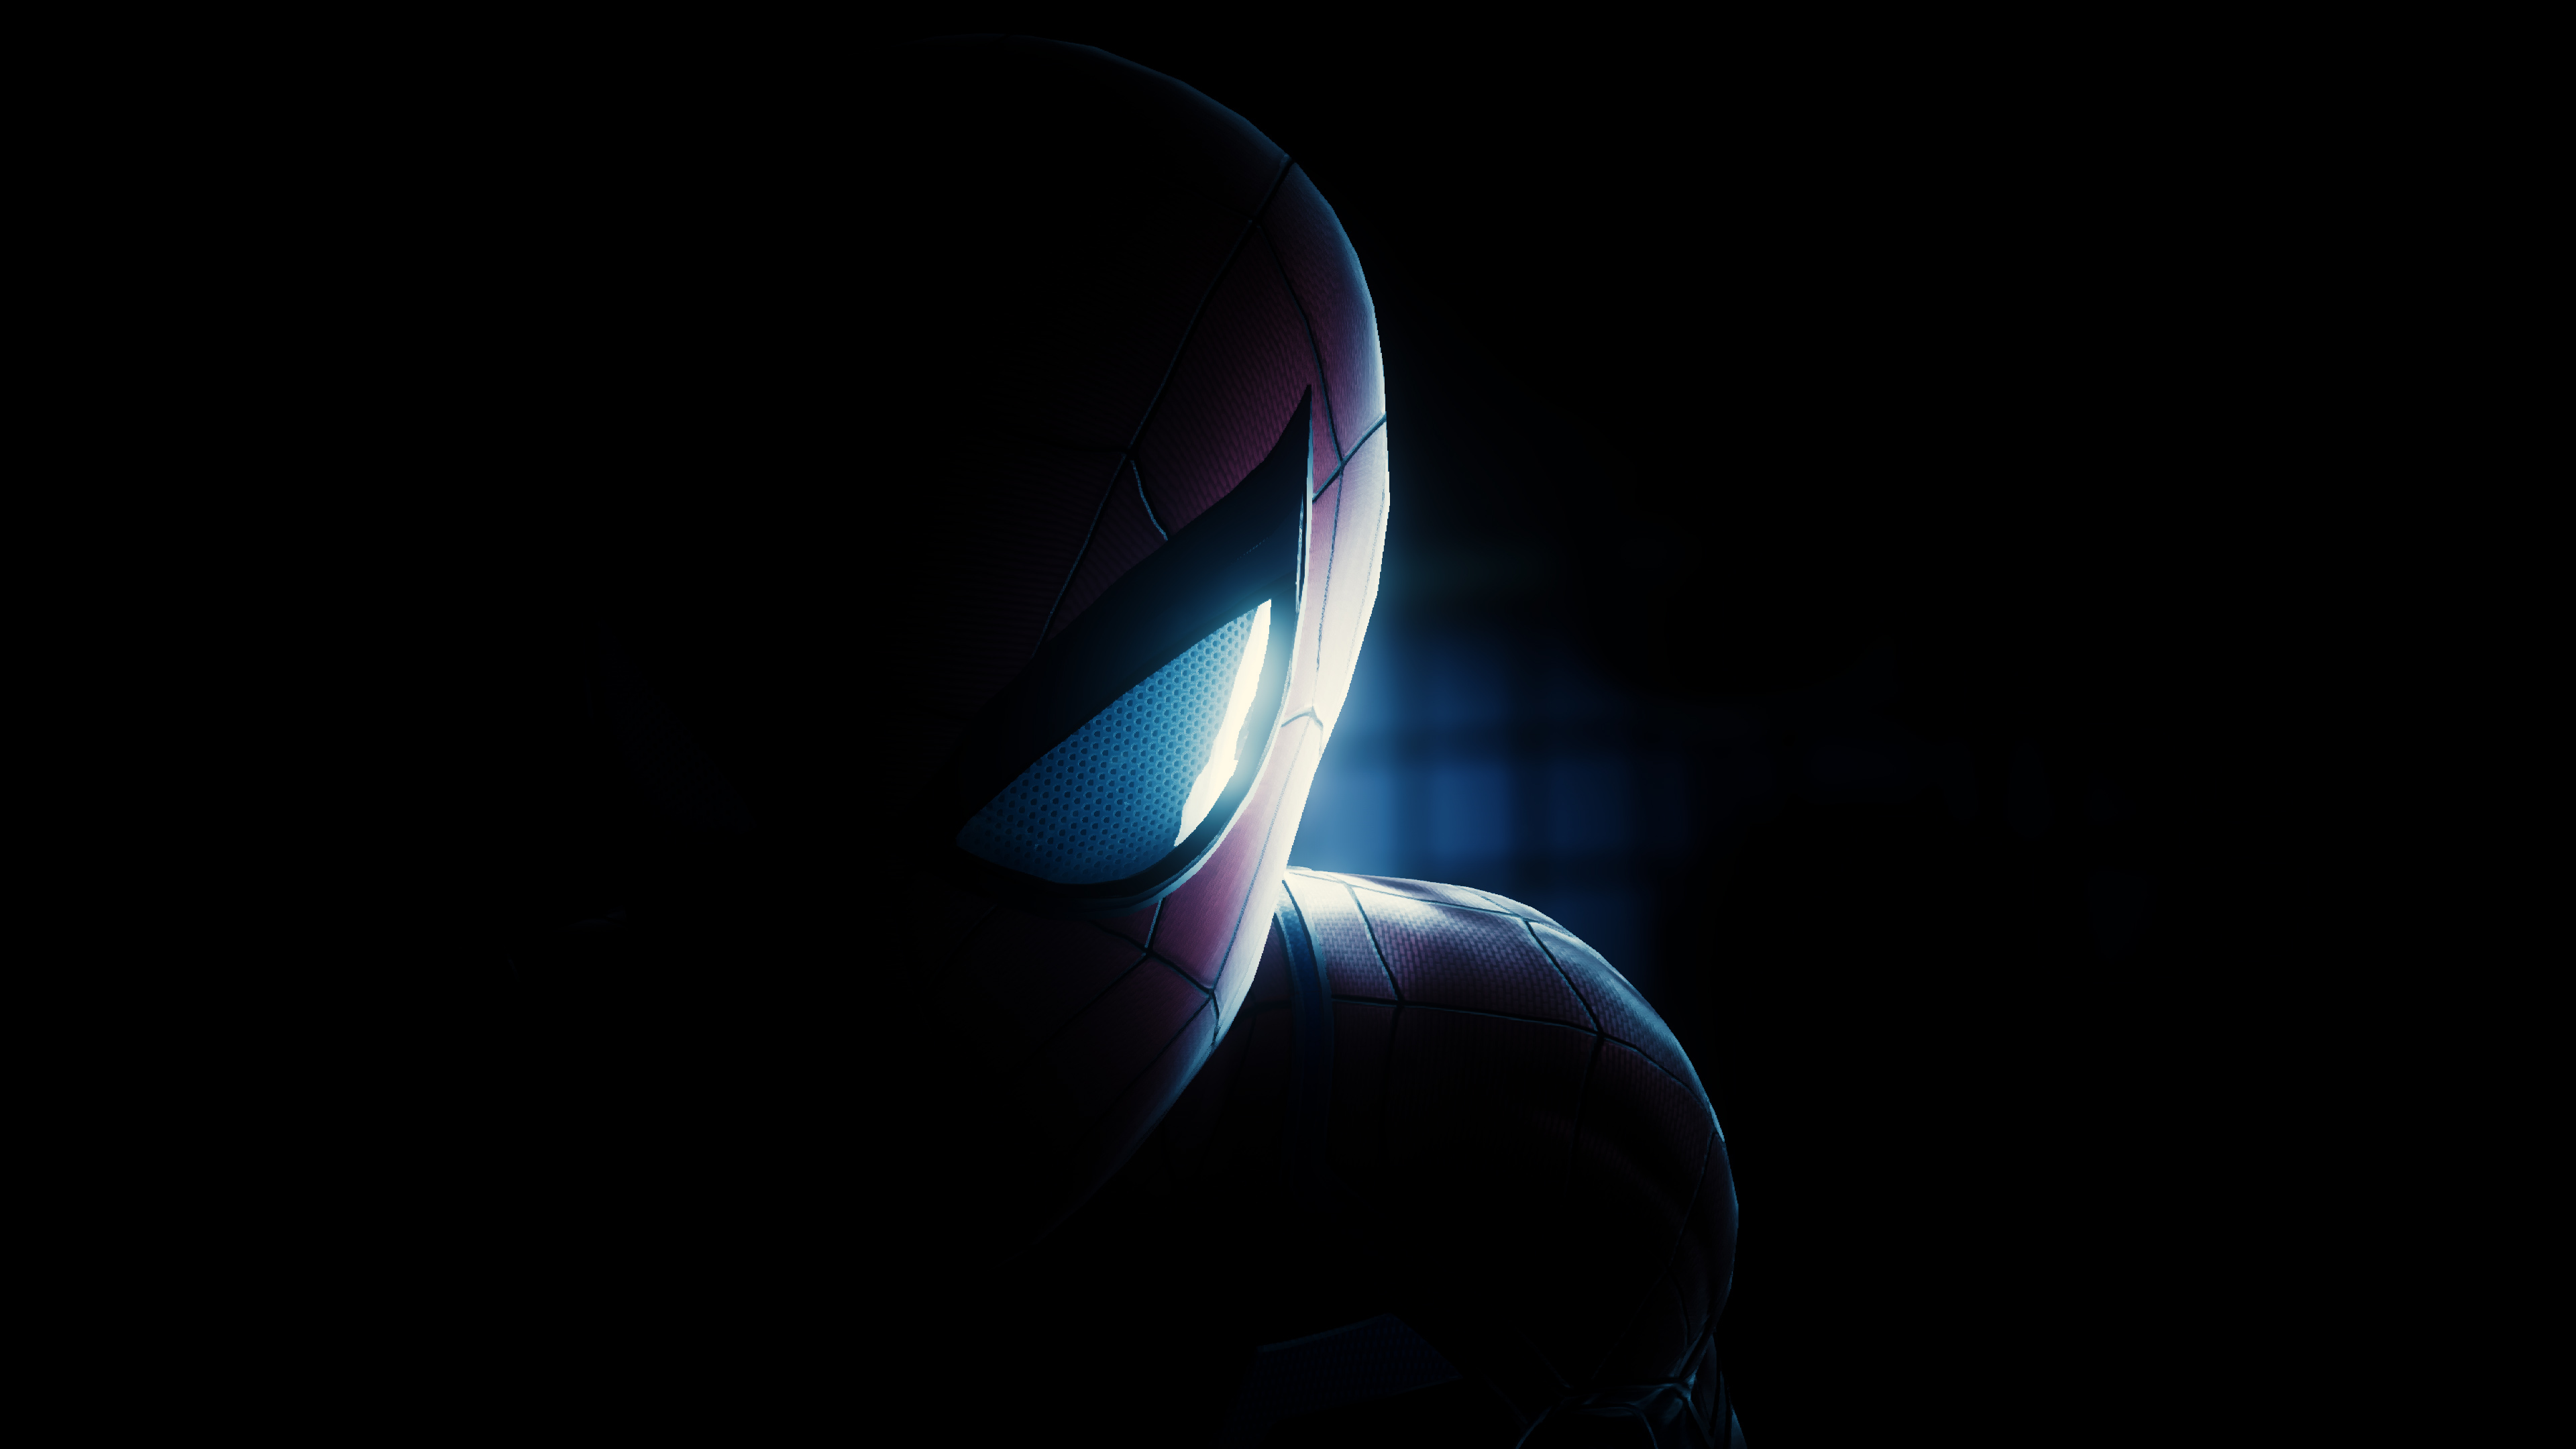 Spiderman Half Mask PS4 Wallpaper, HD